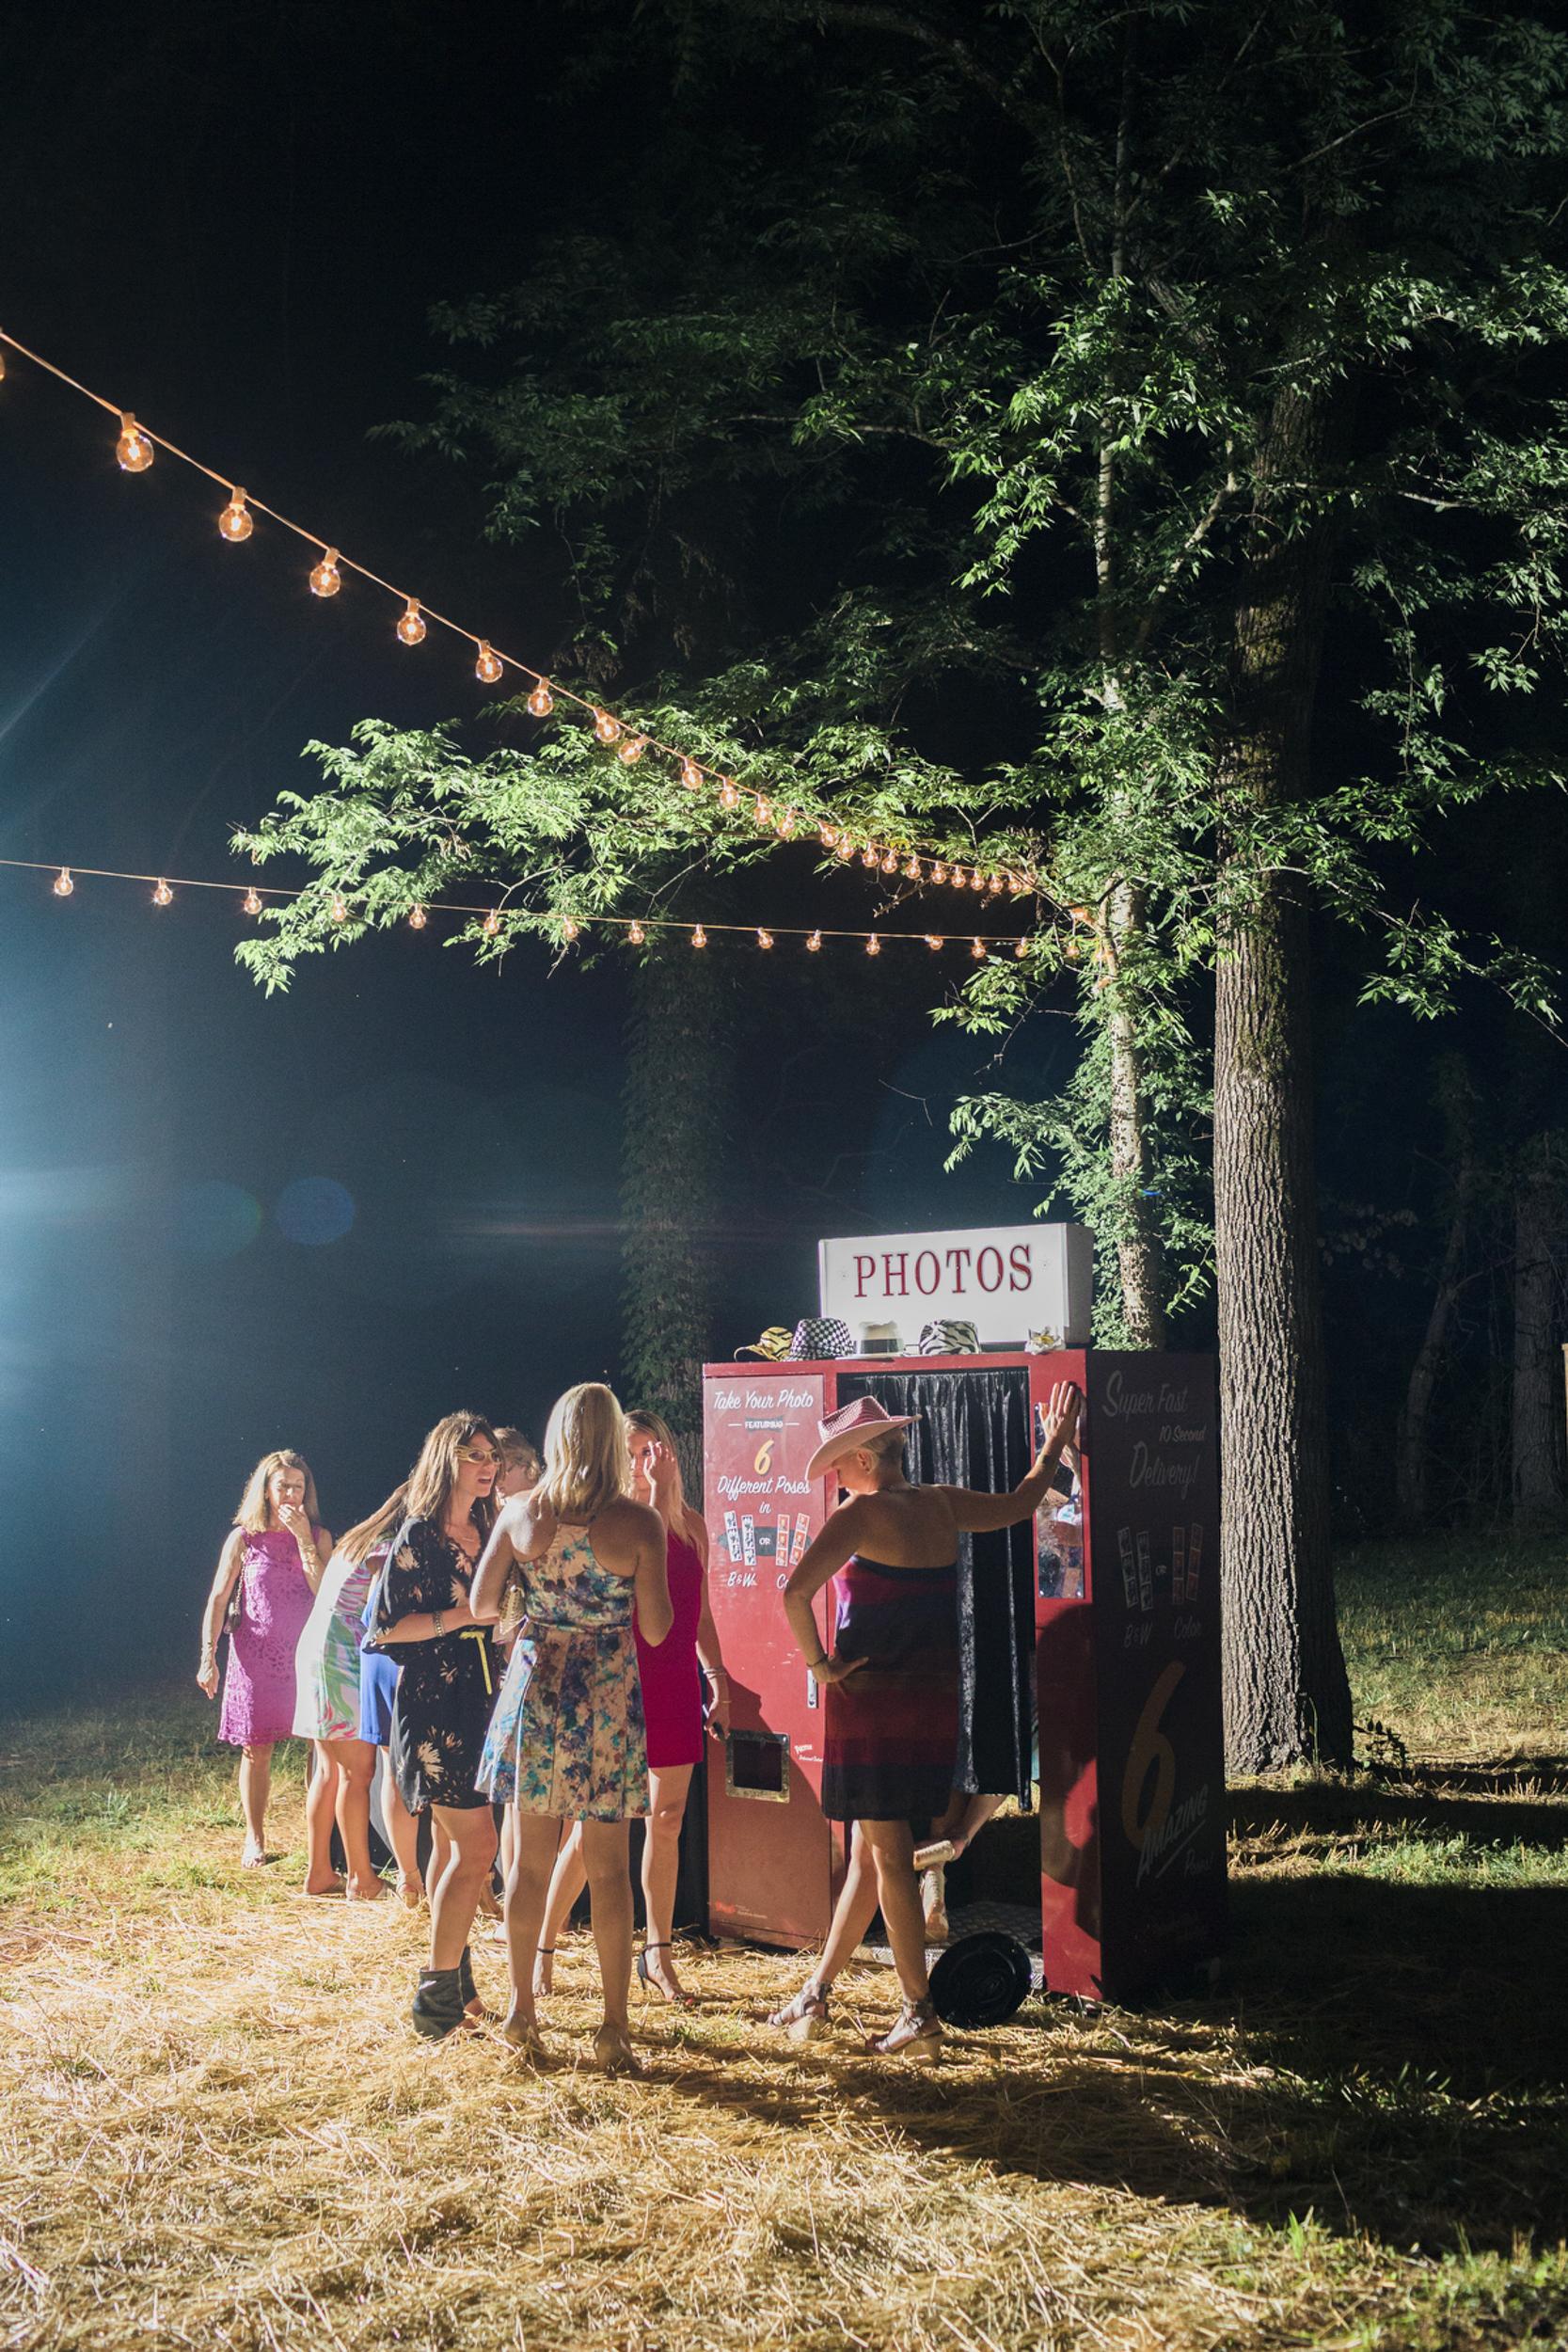 south_carolina_farm_wedding_rustic_chic_surprise_secret_luxe_wedding_bachelorette_emily_maynard_real_weddings-46.jpg